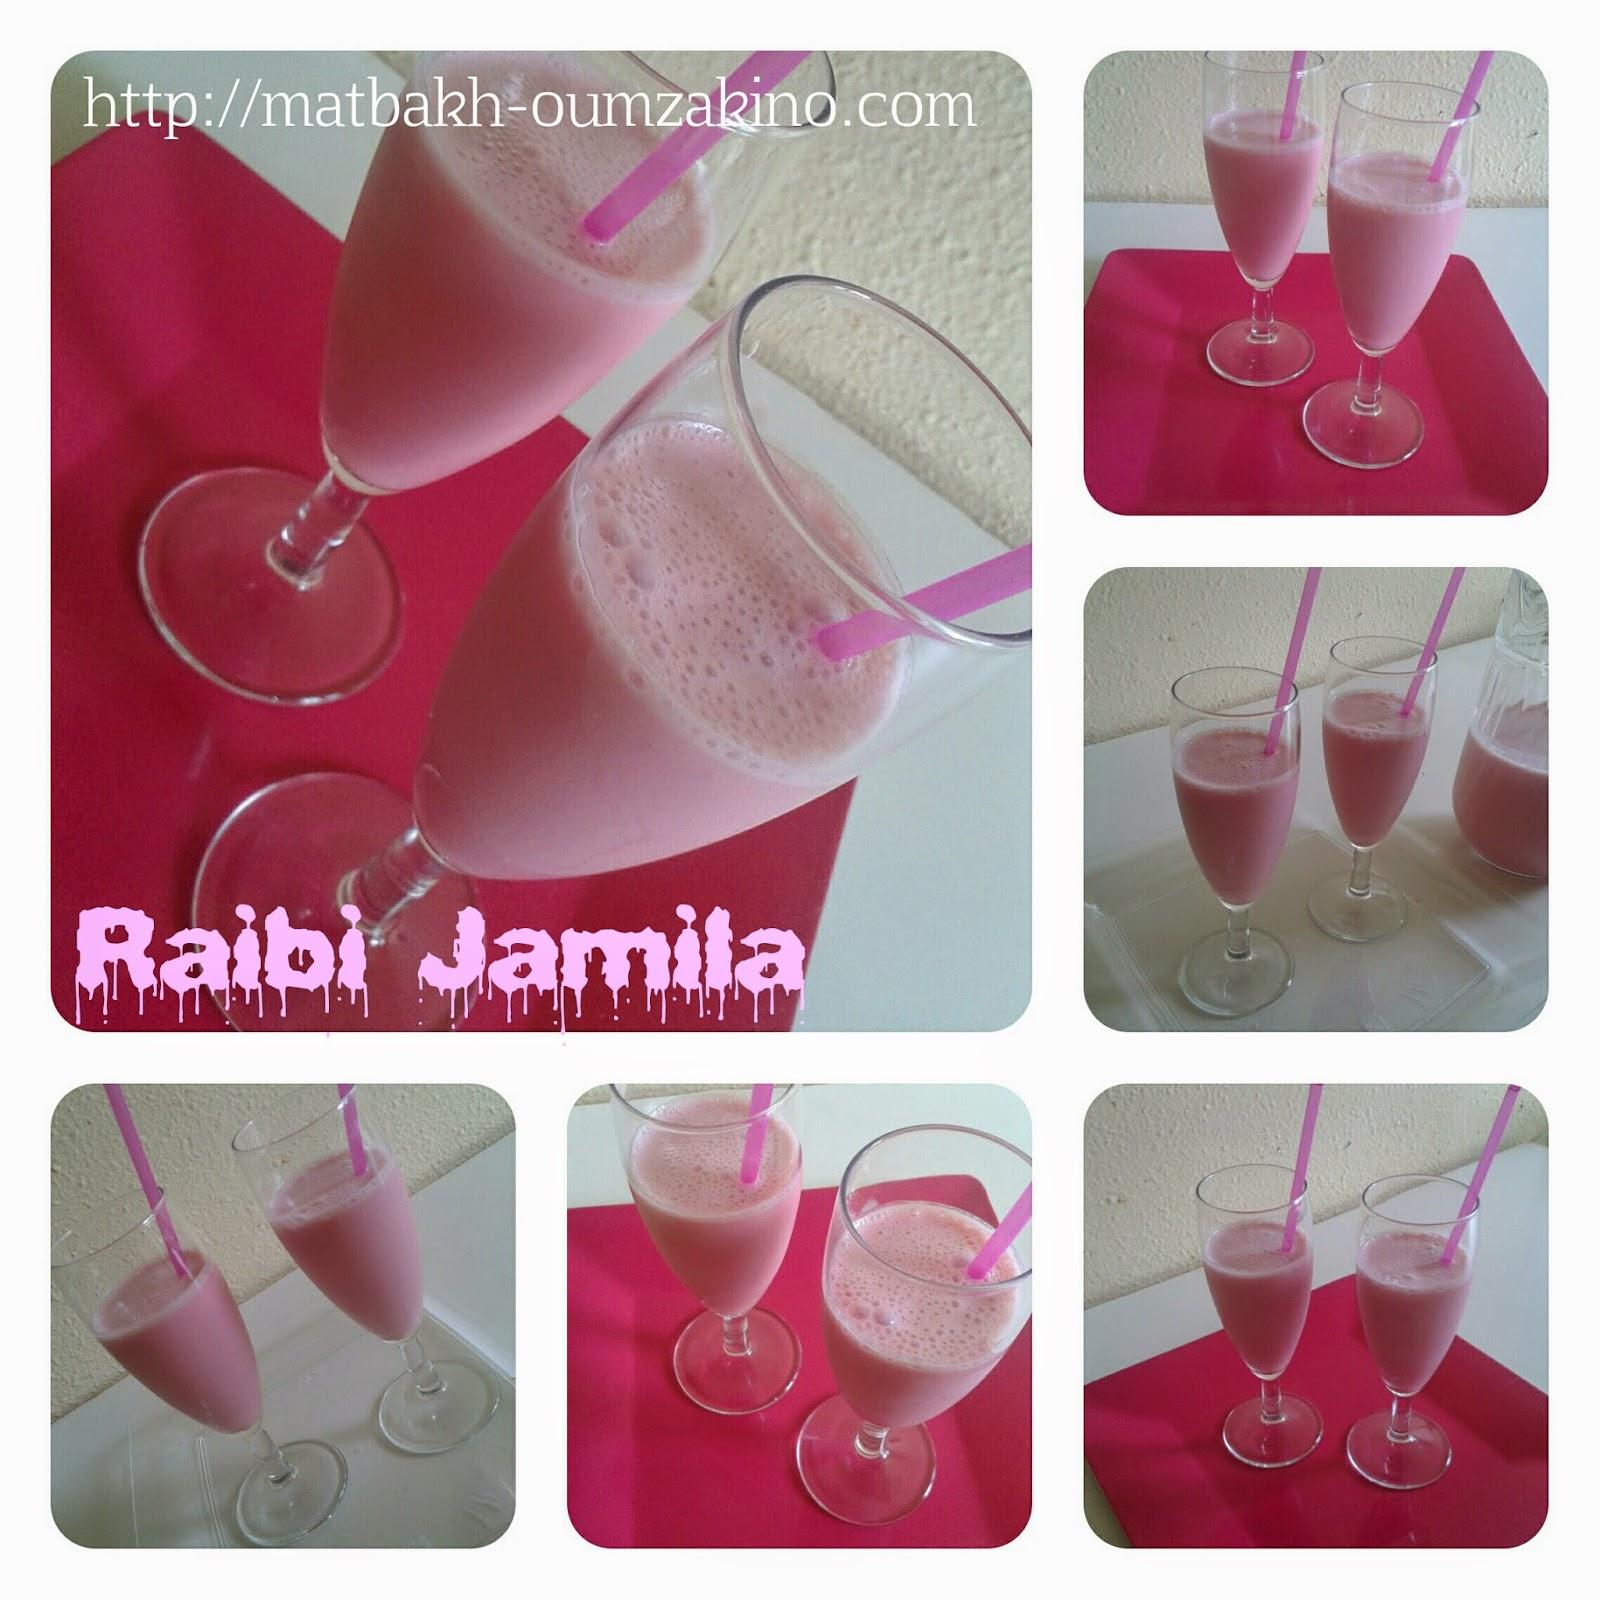 raibi jamila matbakh-oumzakino.com